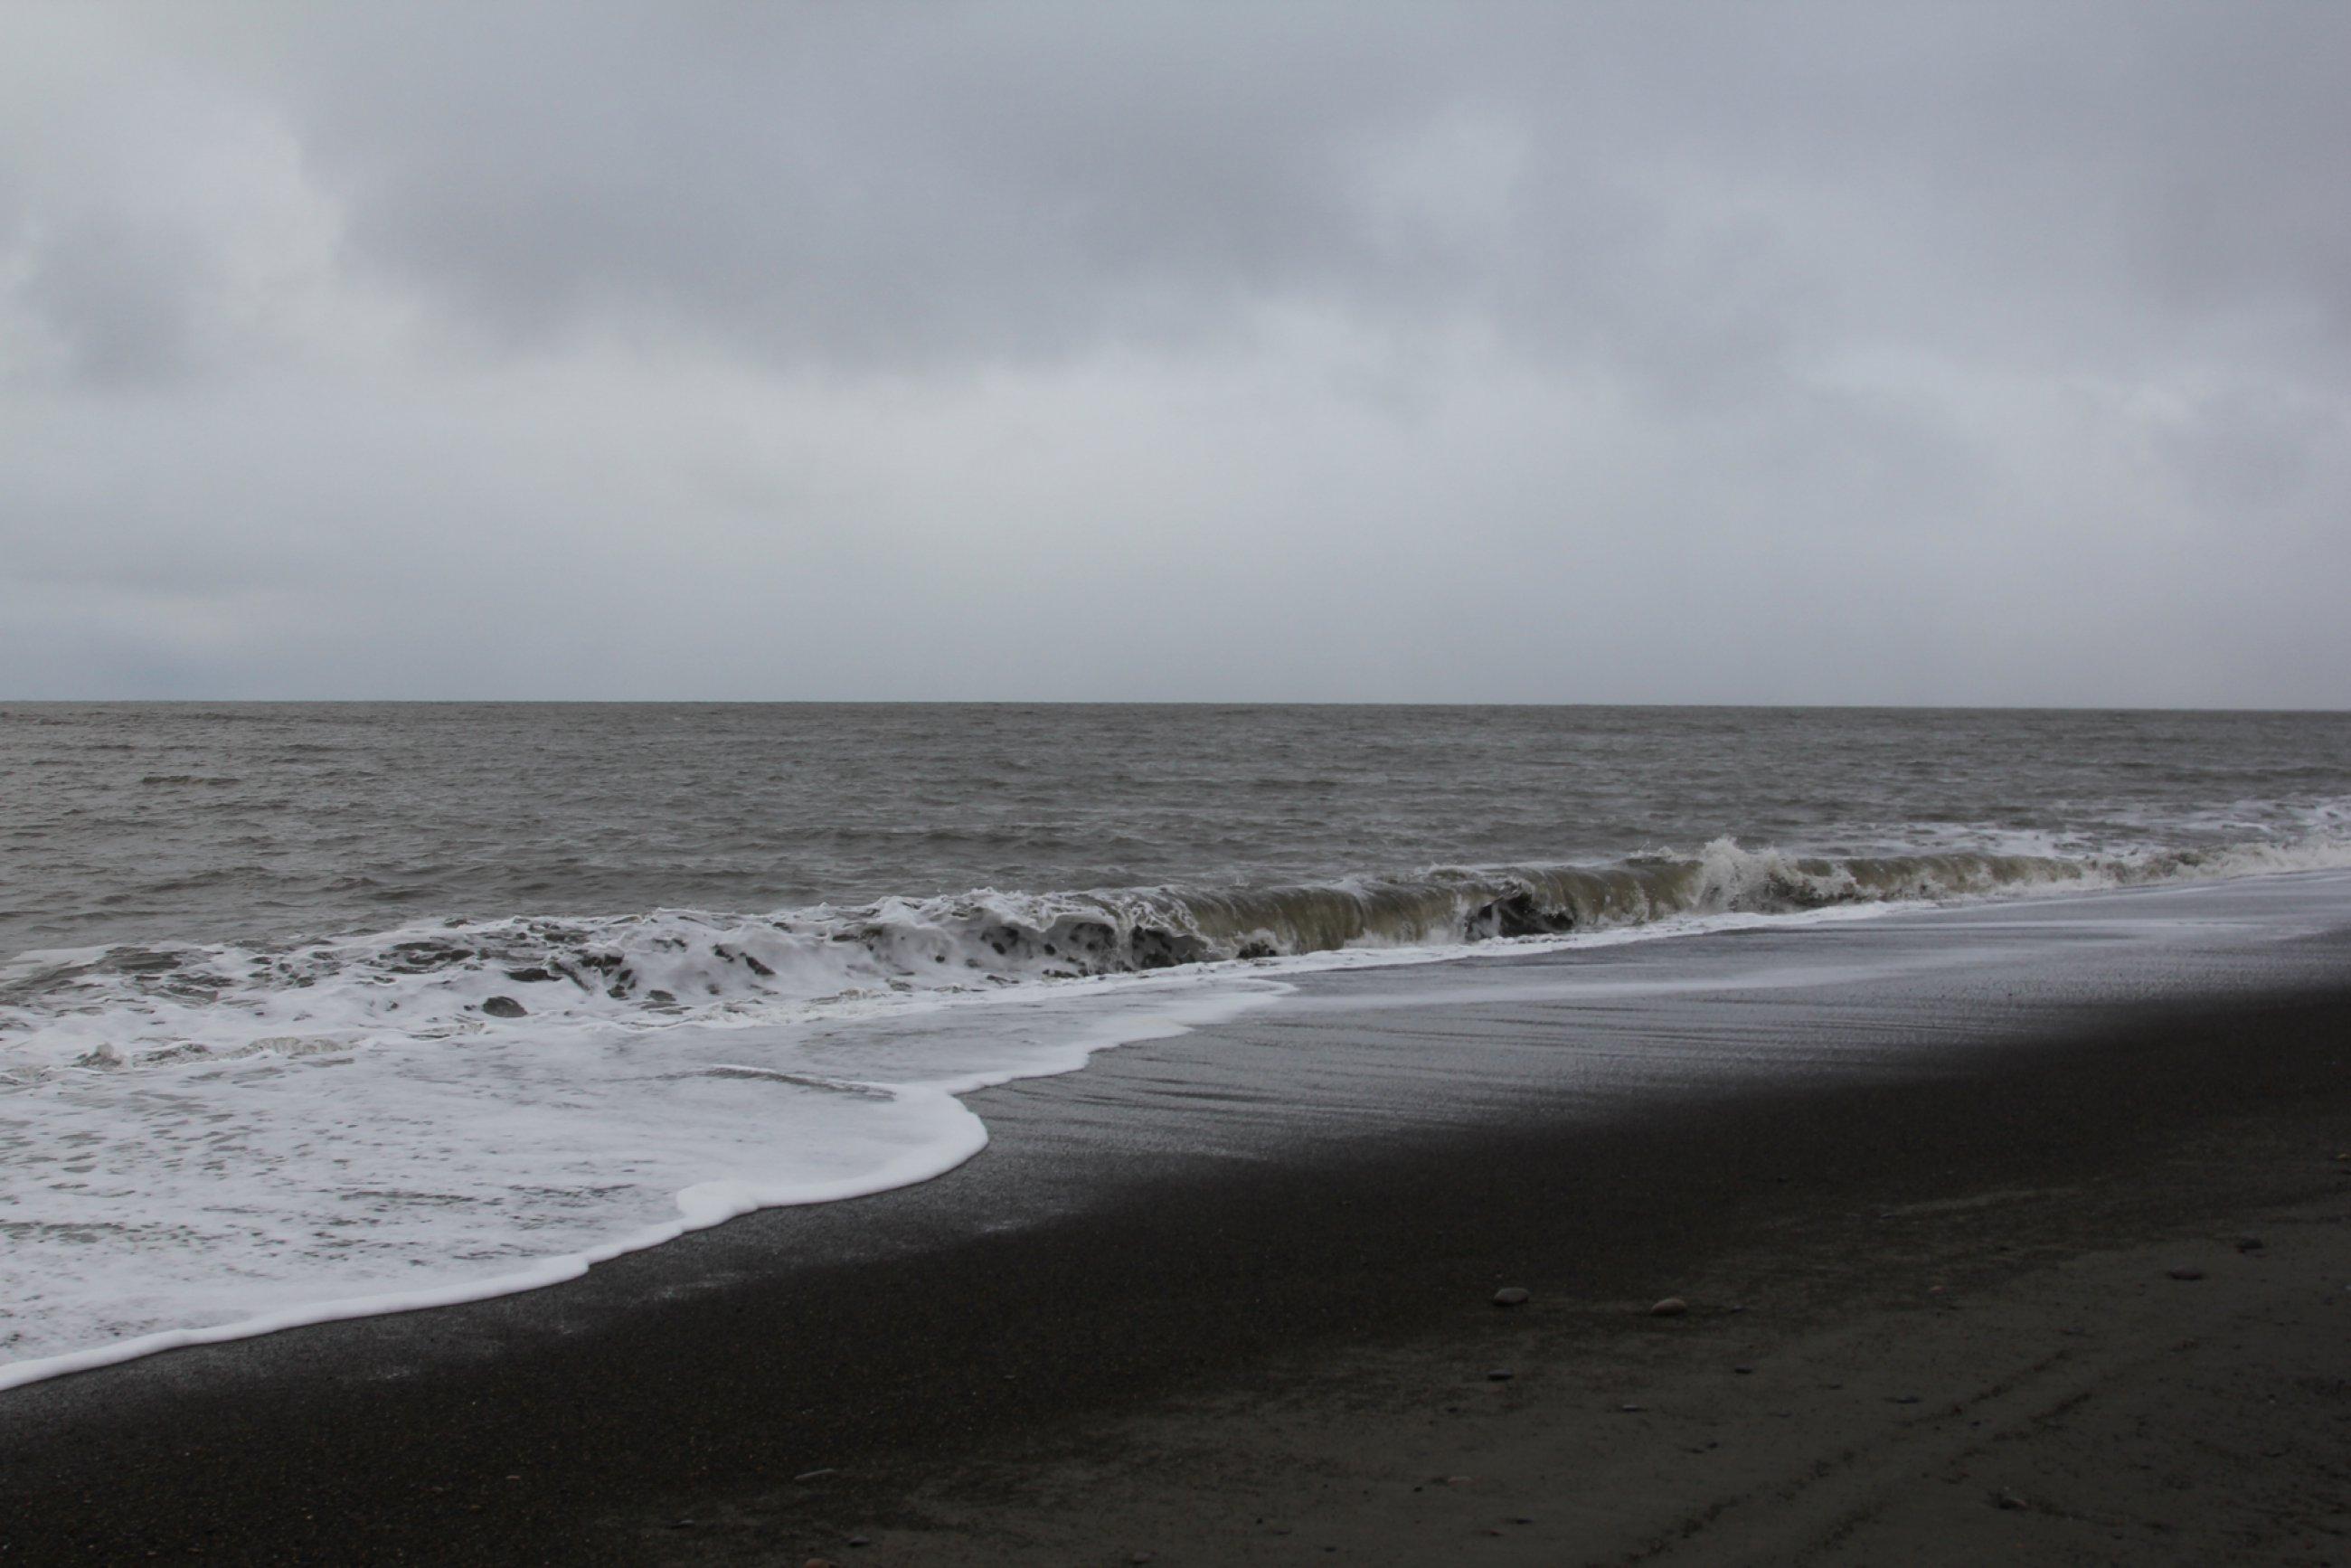 https://bubo.sk/uploads/galleries/7325/barrow-ladovo-chladne-vody-a-cierne-plaze-cukotskeho-mora.jpg